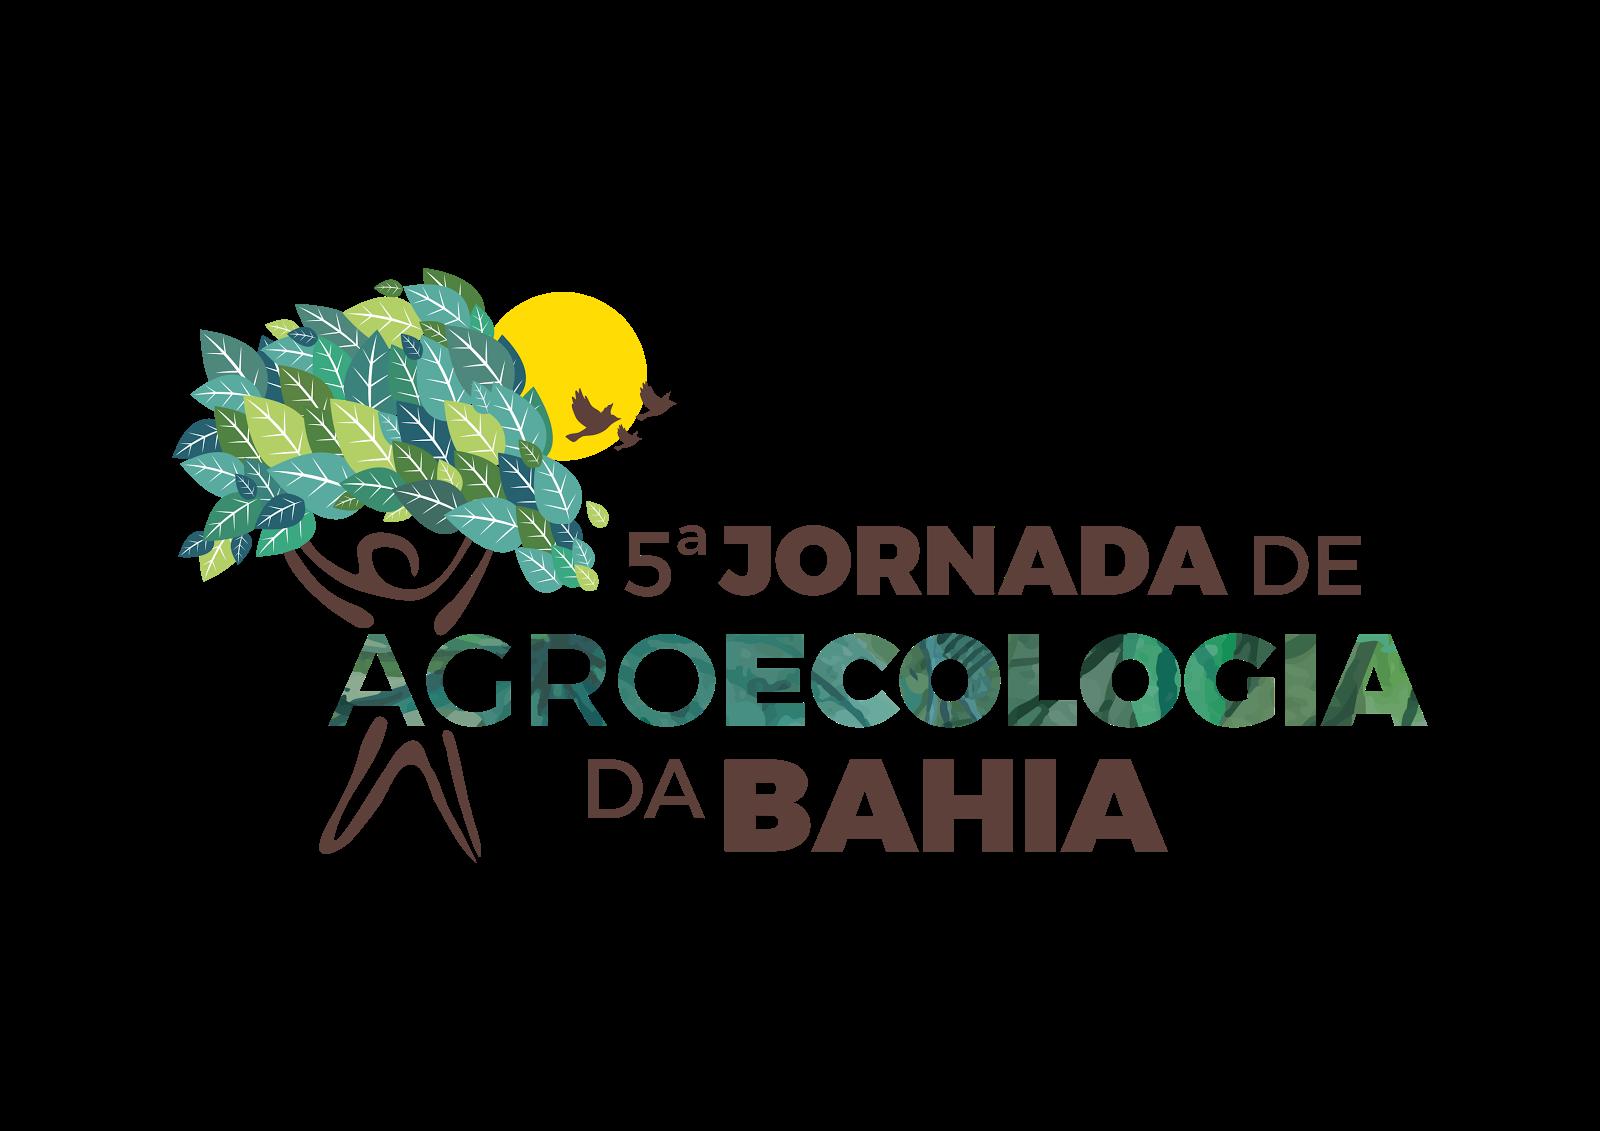 5ª Jornada de Agroecologia da Bahia